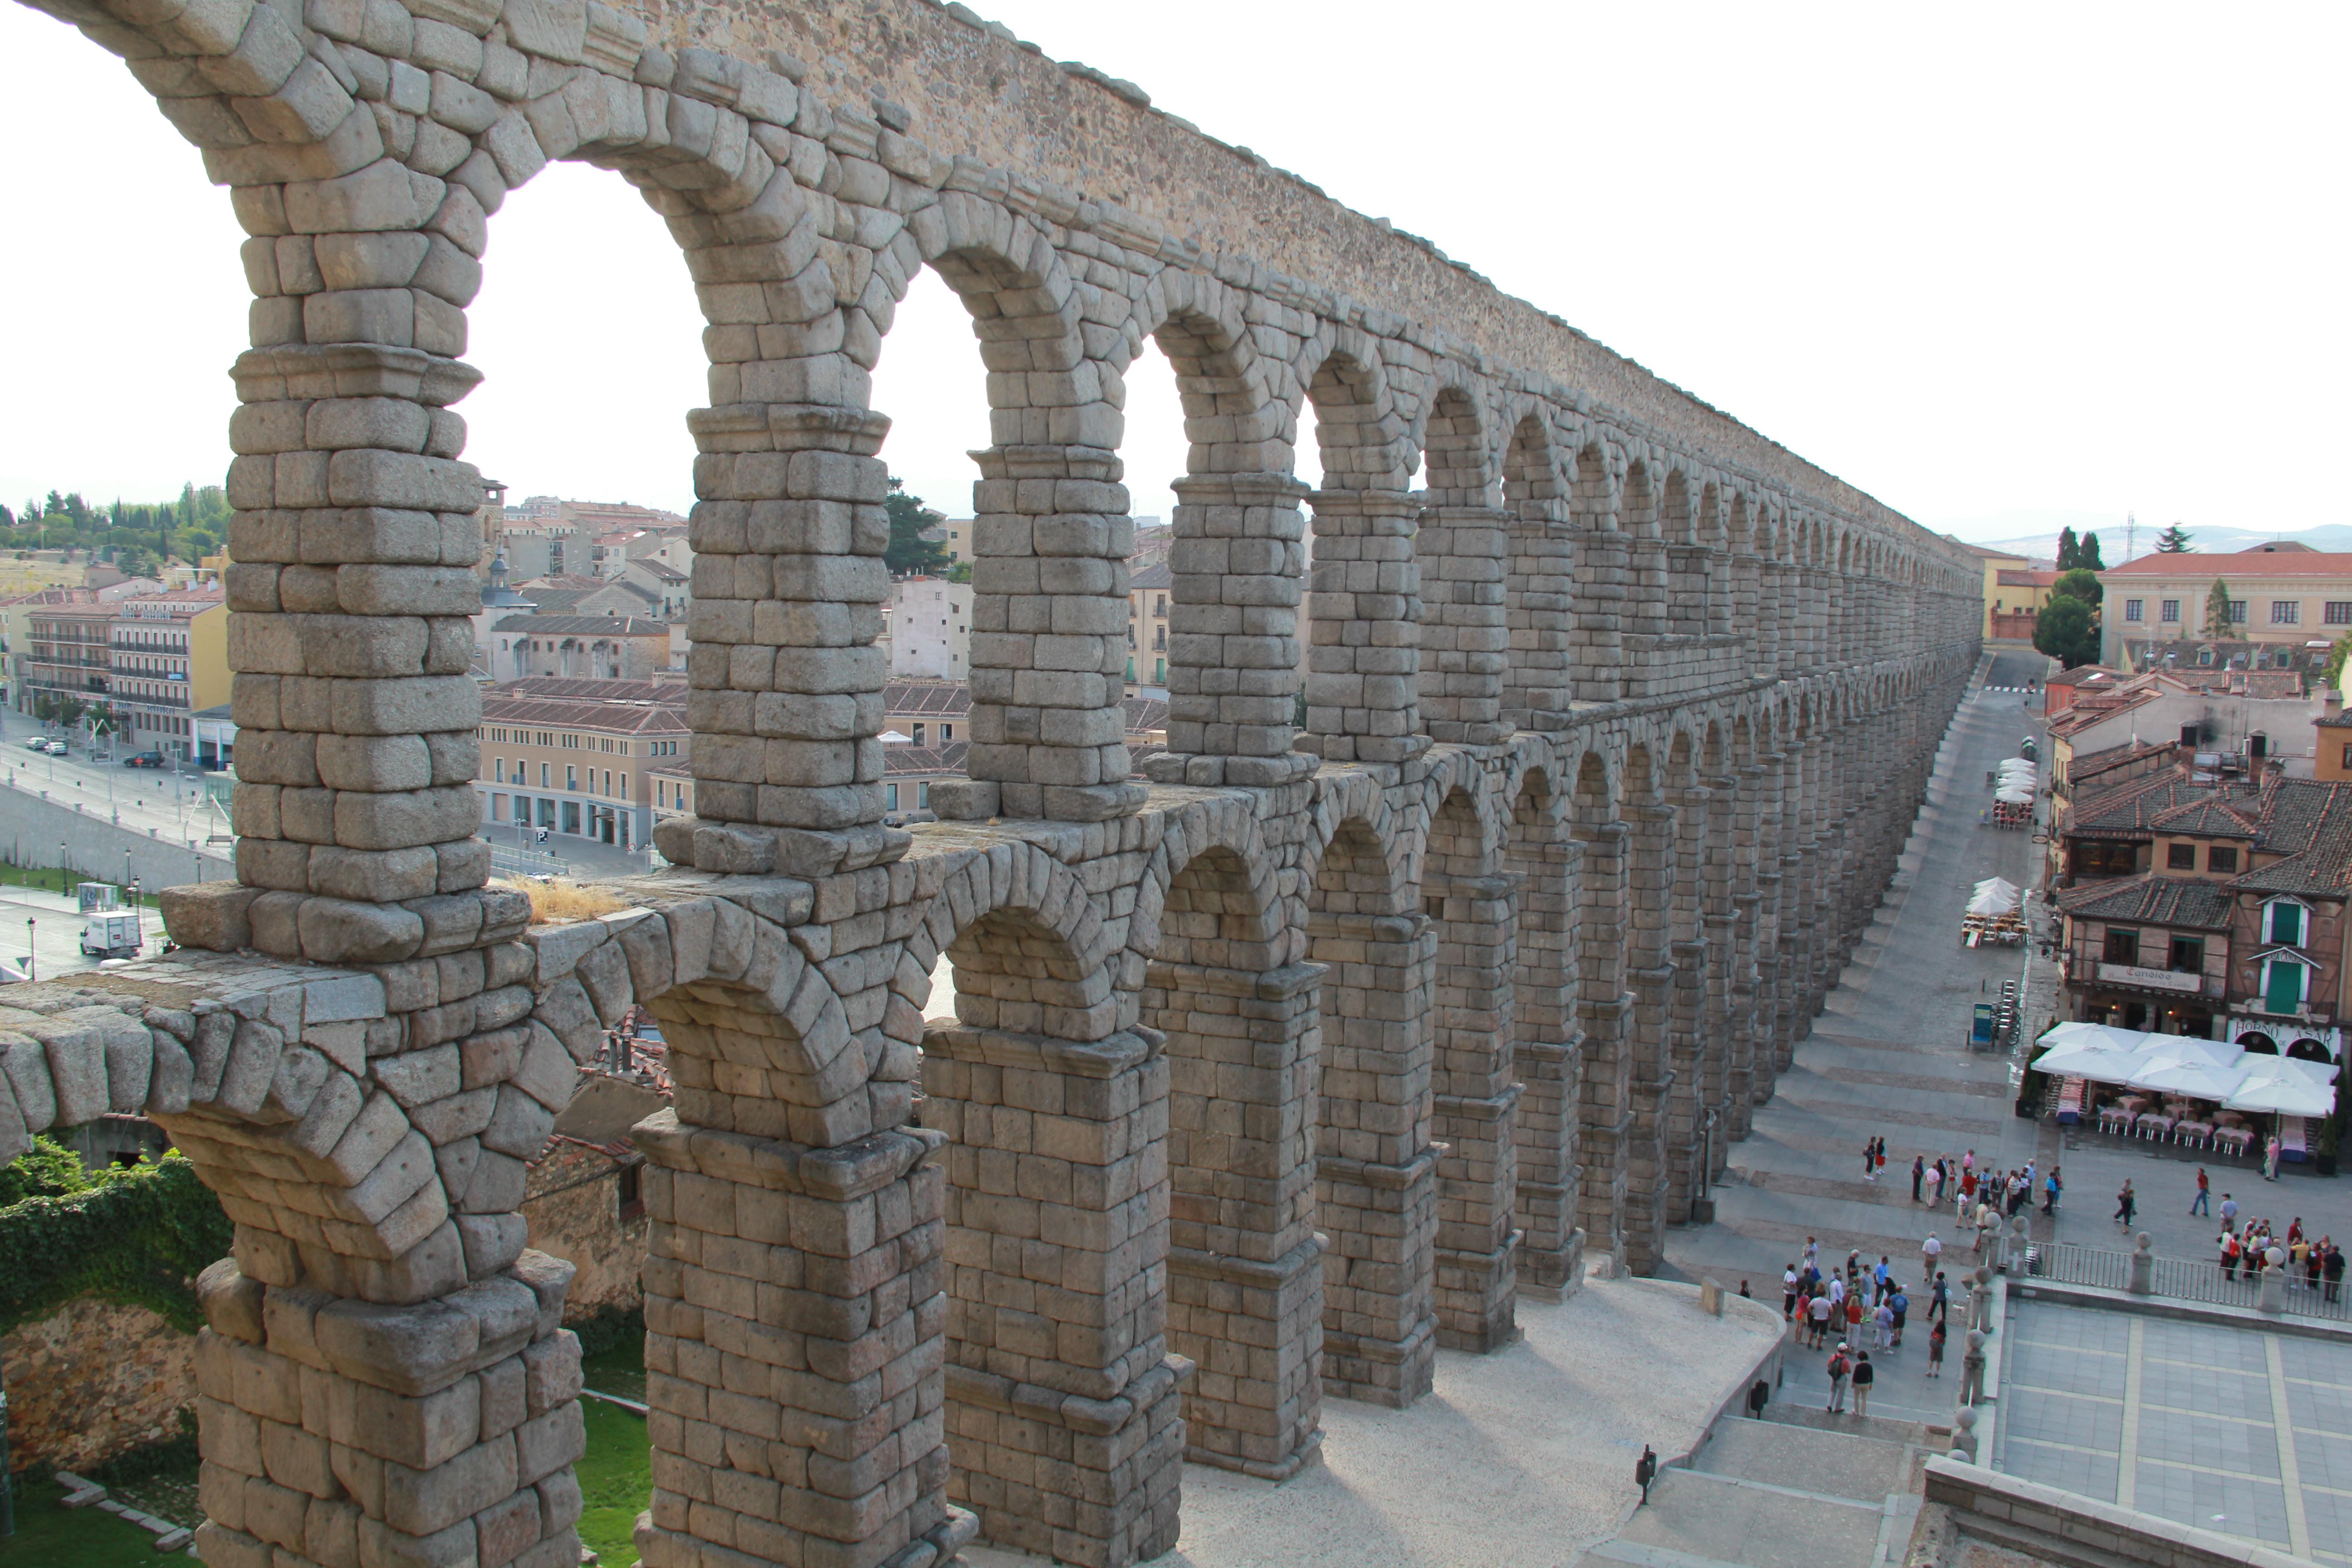 Aqueduct | Segovia, Spain